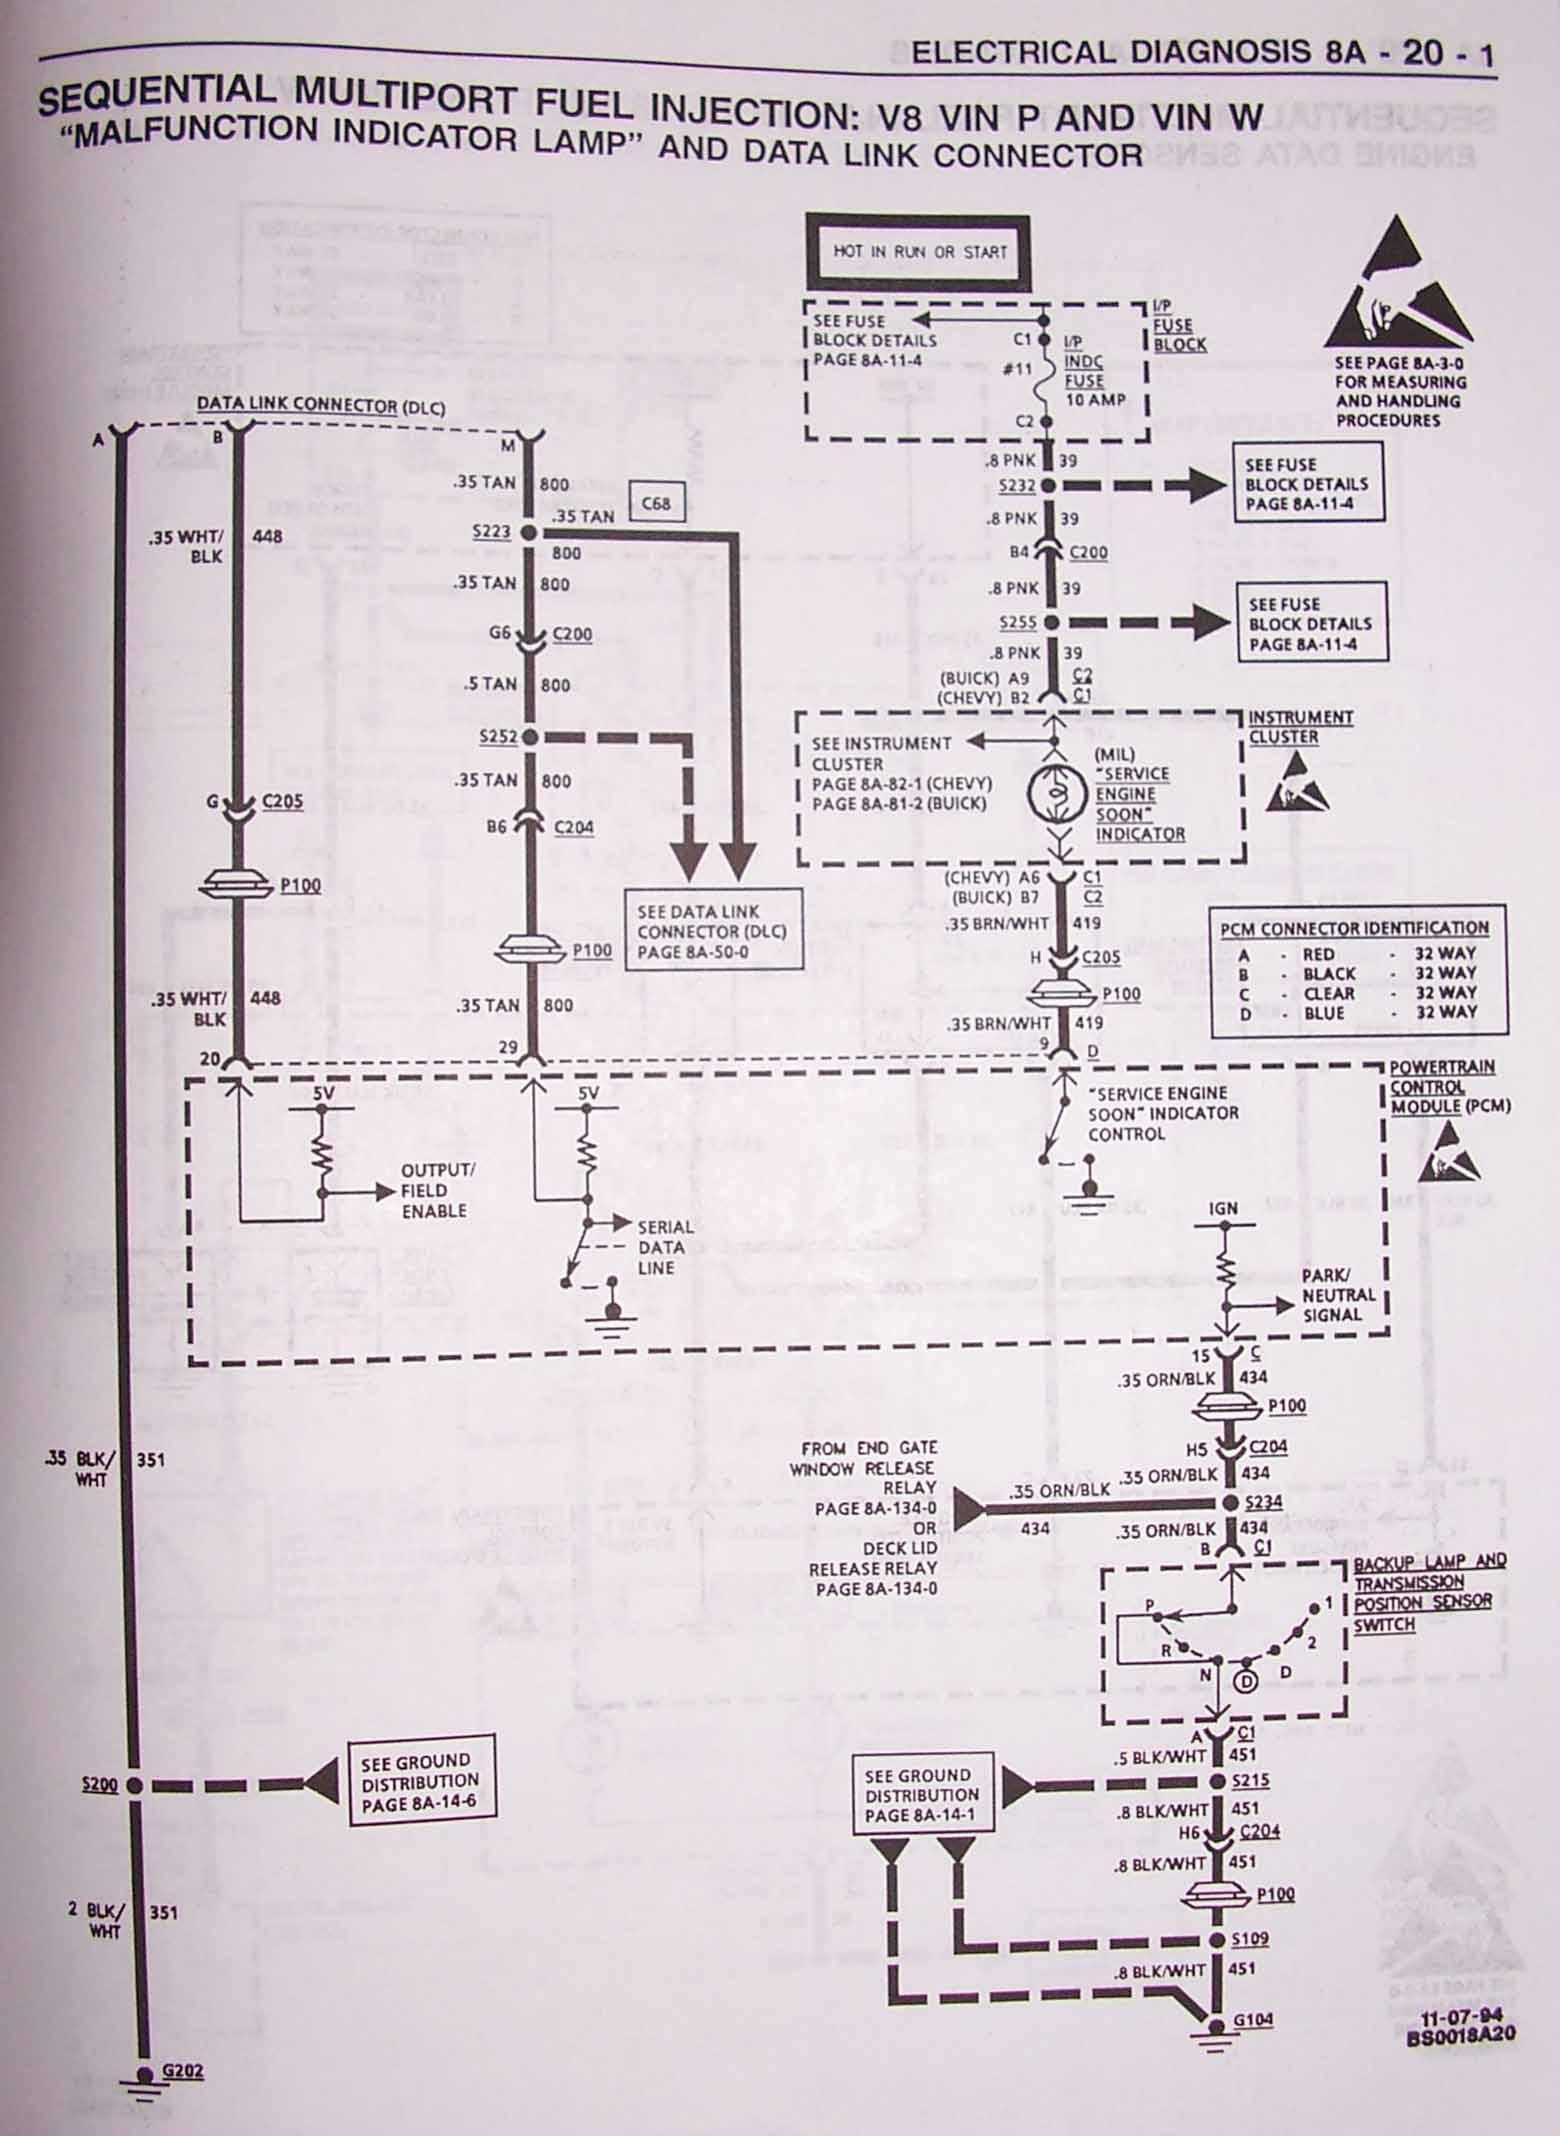 94 Caprice Starter Wiring Diagram Chevy 4l60e Wiring Diagram 2003 For Wiring Diagram Schematics